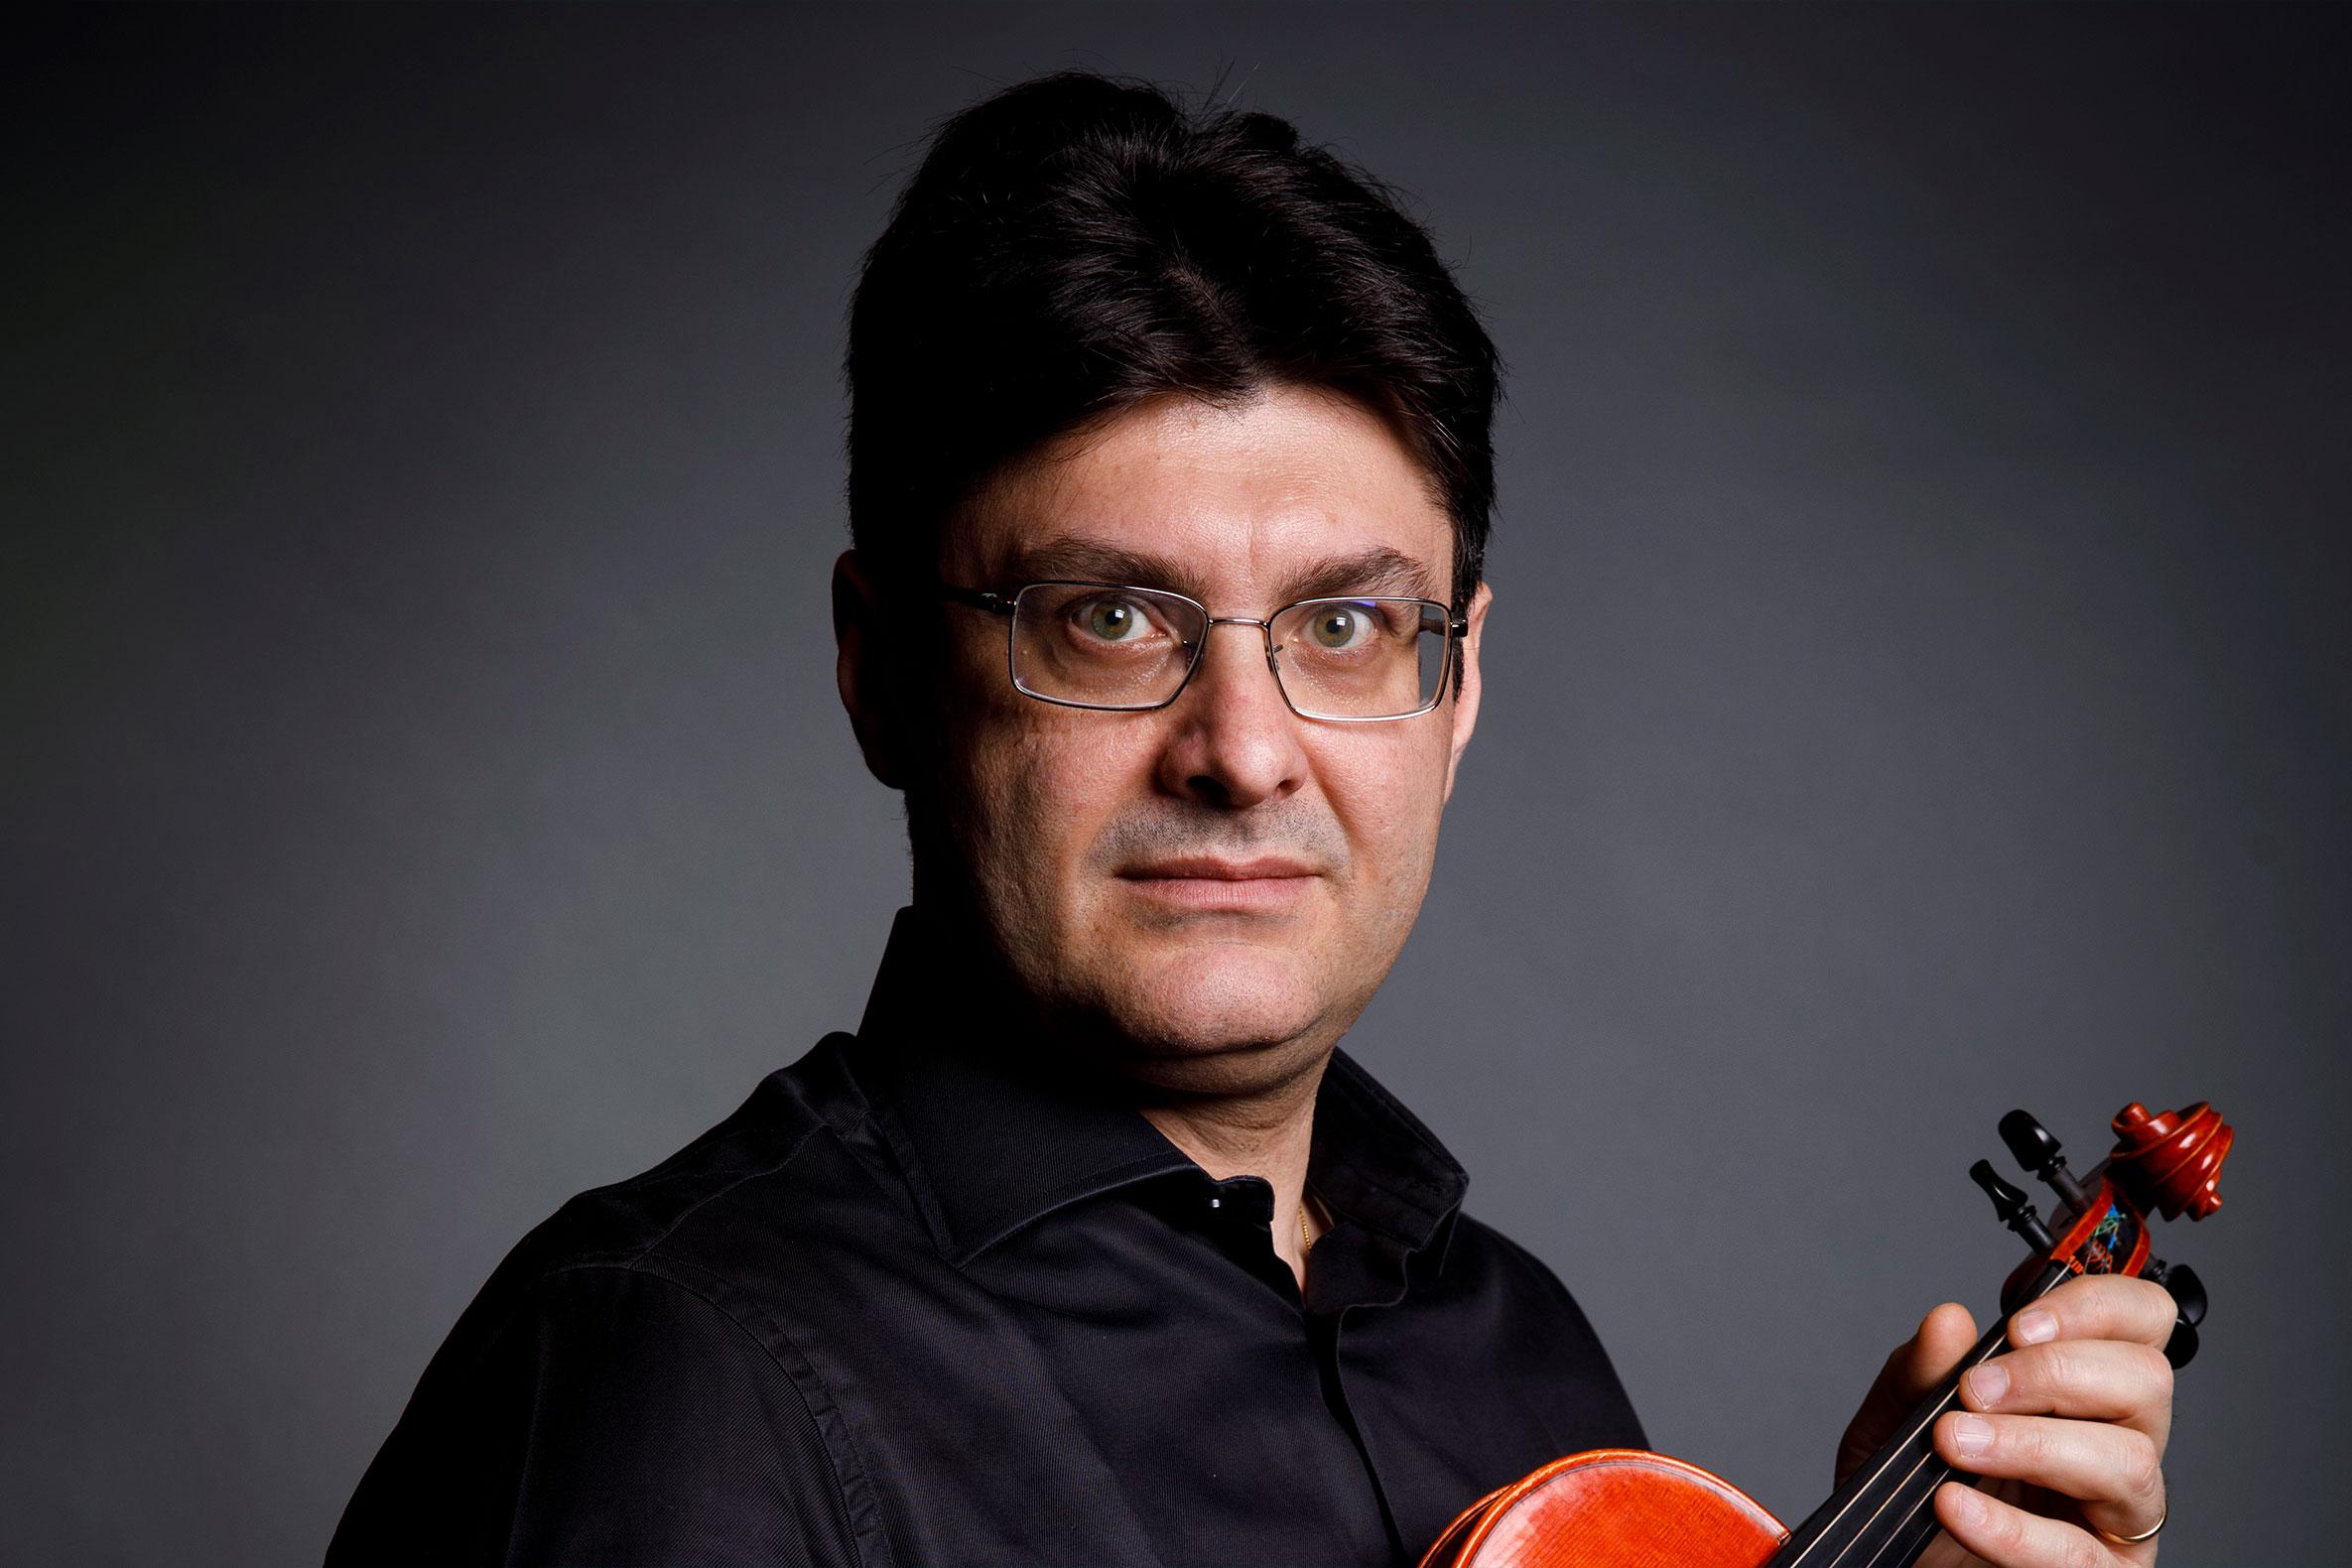 Ruggiero Sfregola